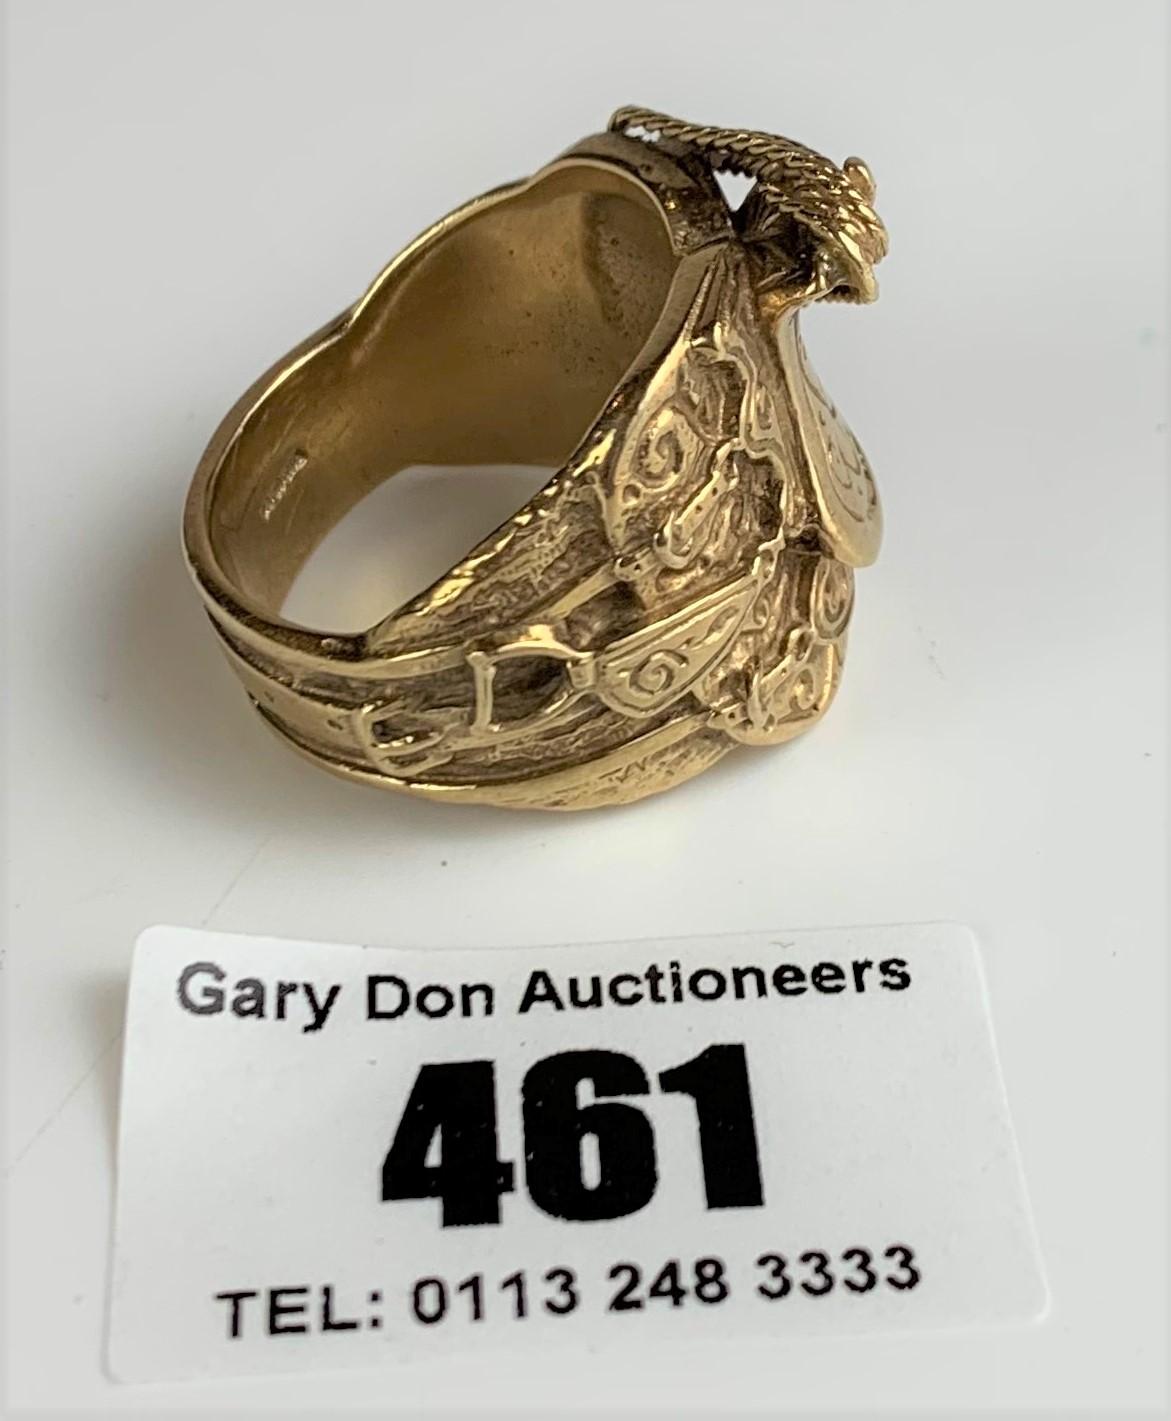 9k gold gents saddle ring, size Z+, w:26 gms - Image 3 of 6